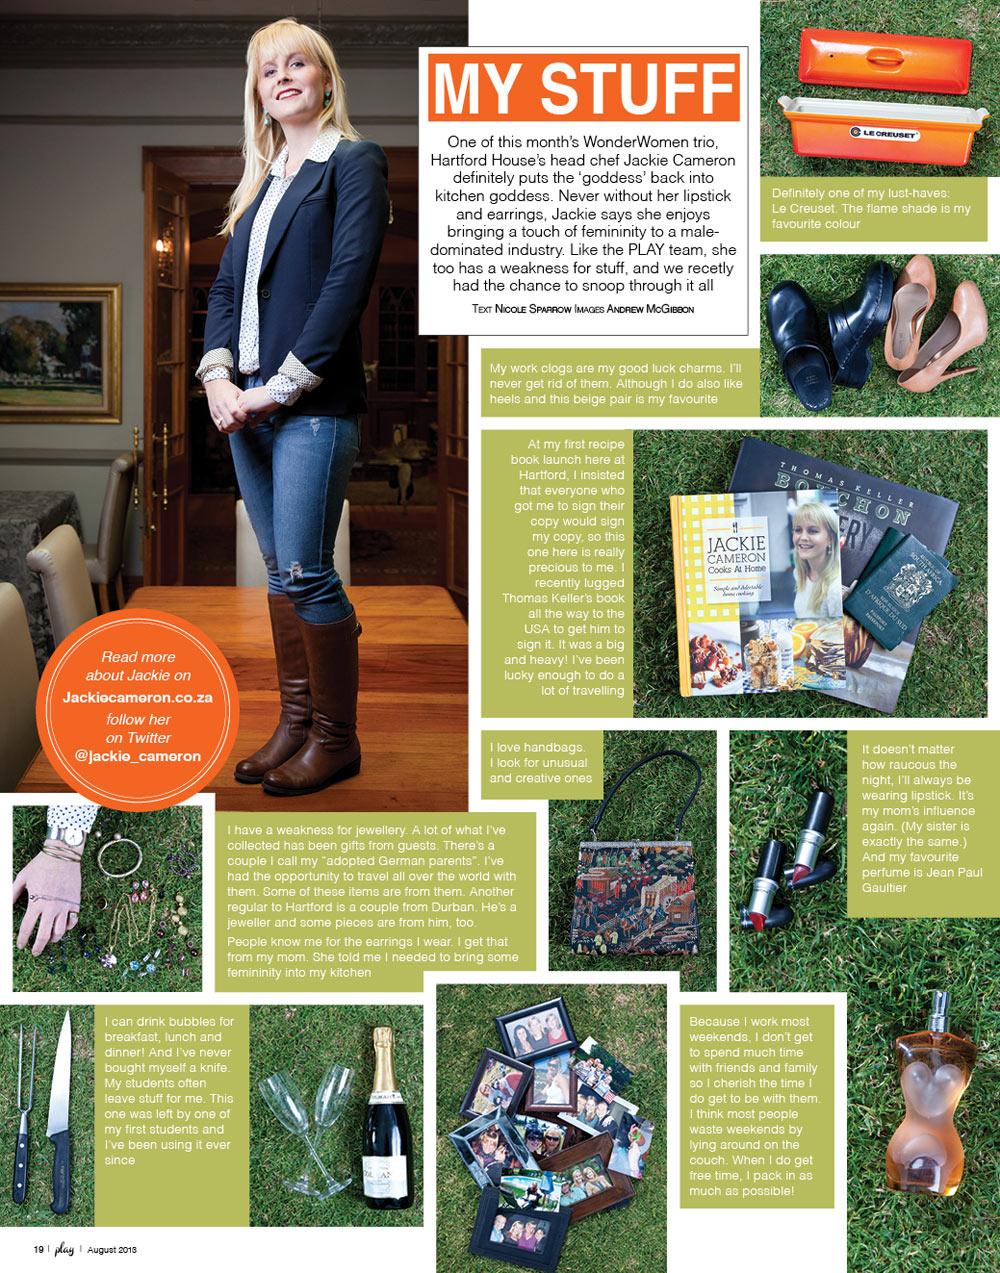 Play Magazine - Jackie Cameron - My Stuff